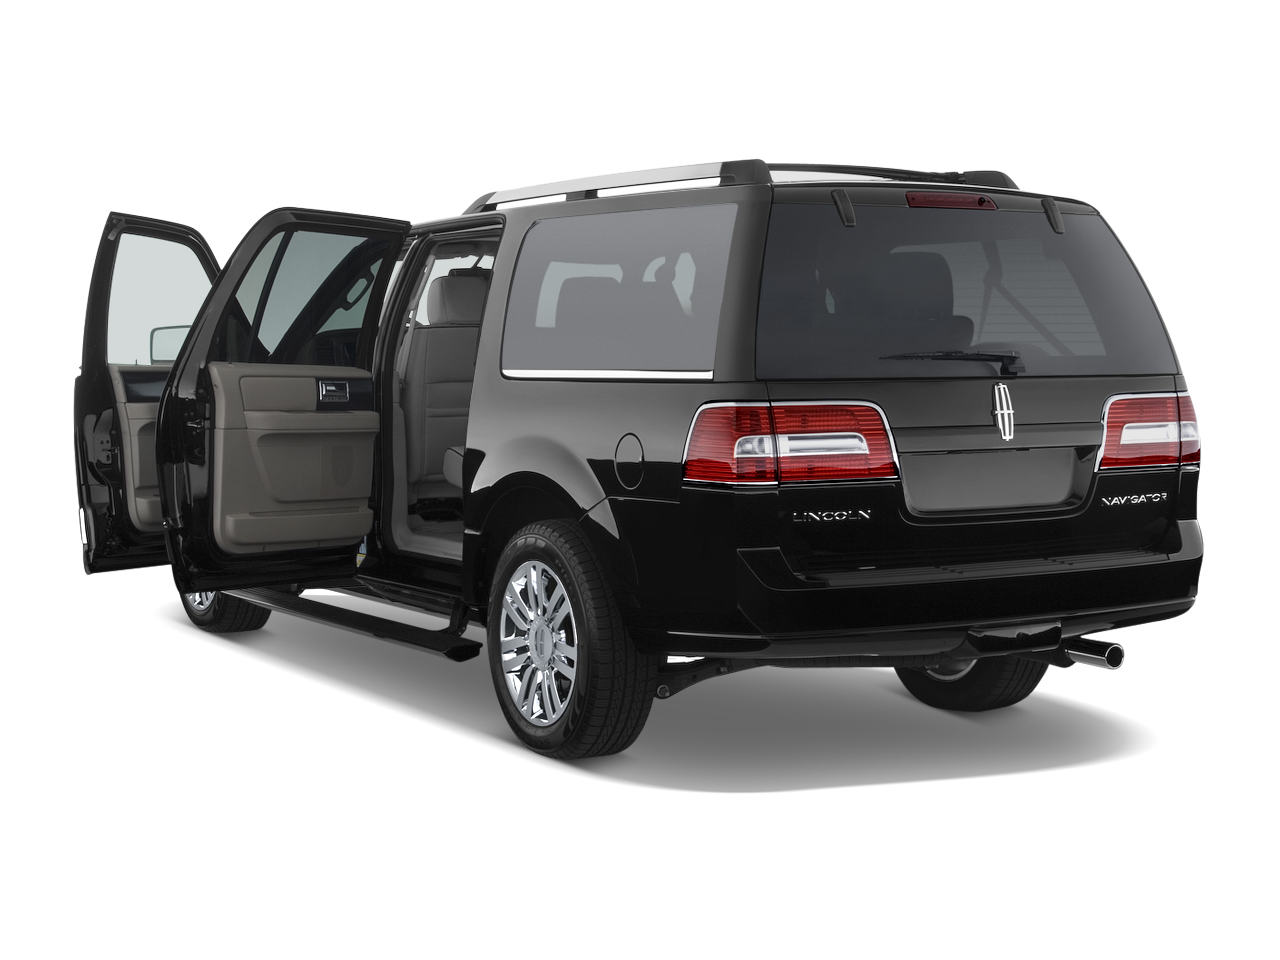 http://st.automobilemag.com/uploads/sites/10/2015/11/2007-lincoln-navigator-l-4wd-suv-doors.png